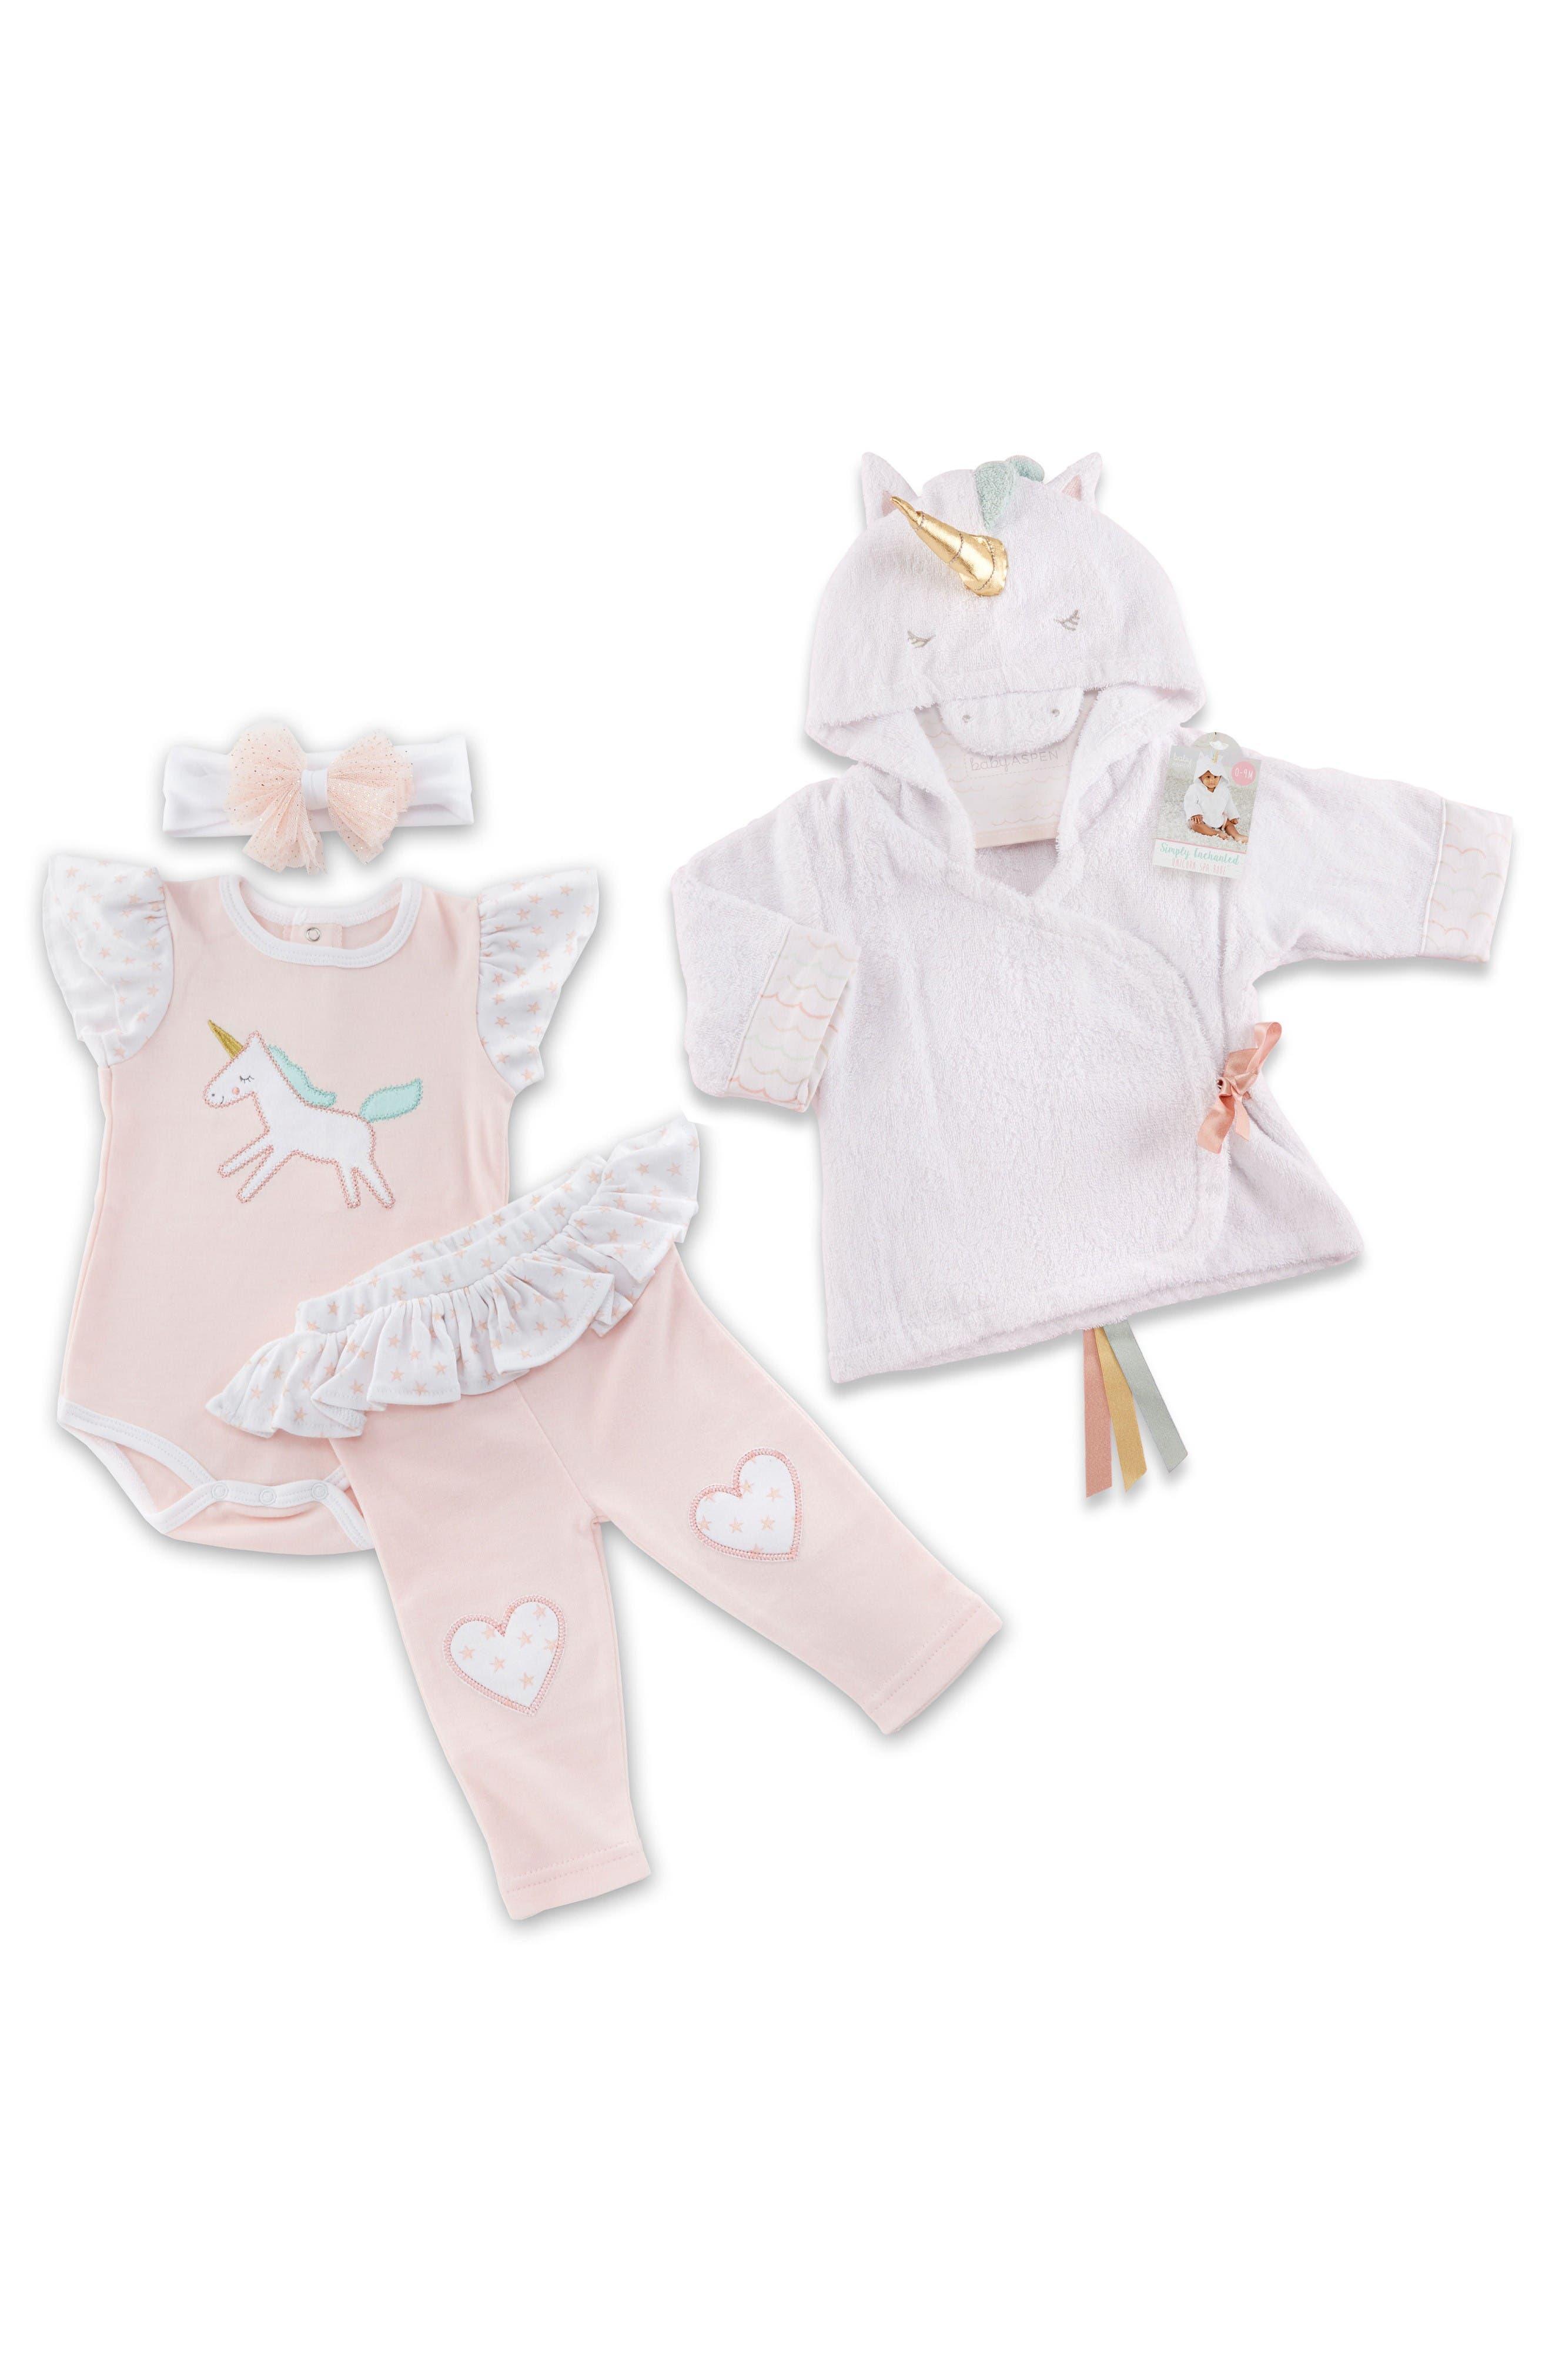 Alternate Image 1 Selected - Baby Aspen Simply Enchanted Unicorn Spa 4-Piece Gift Set (Baby Girls)